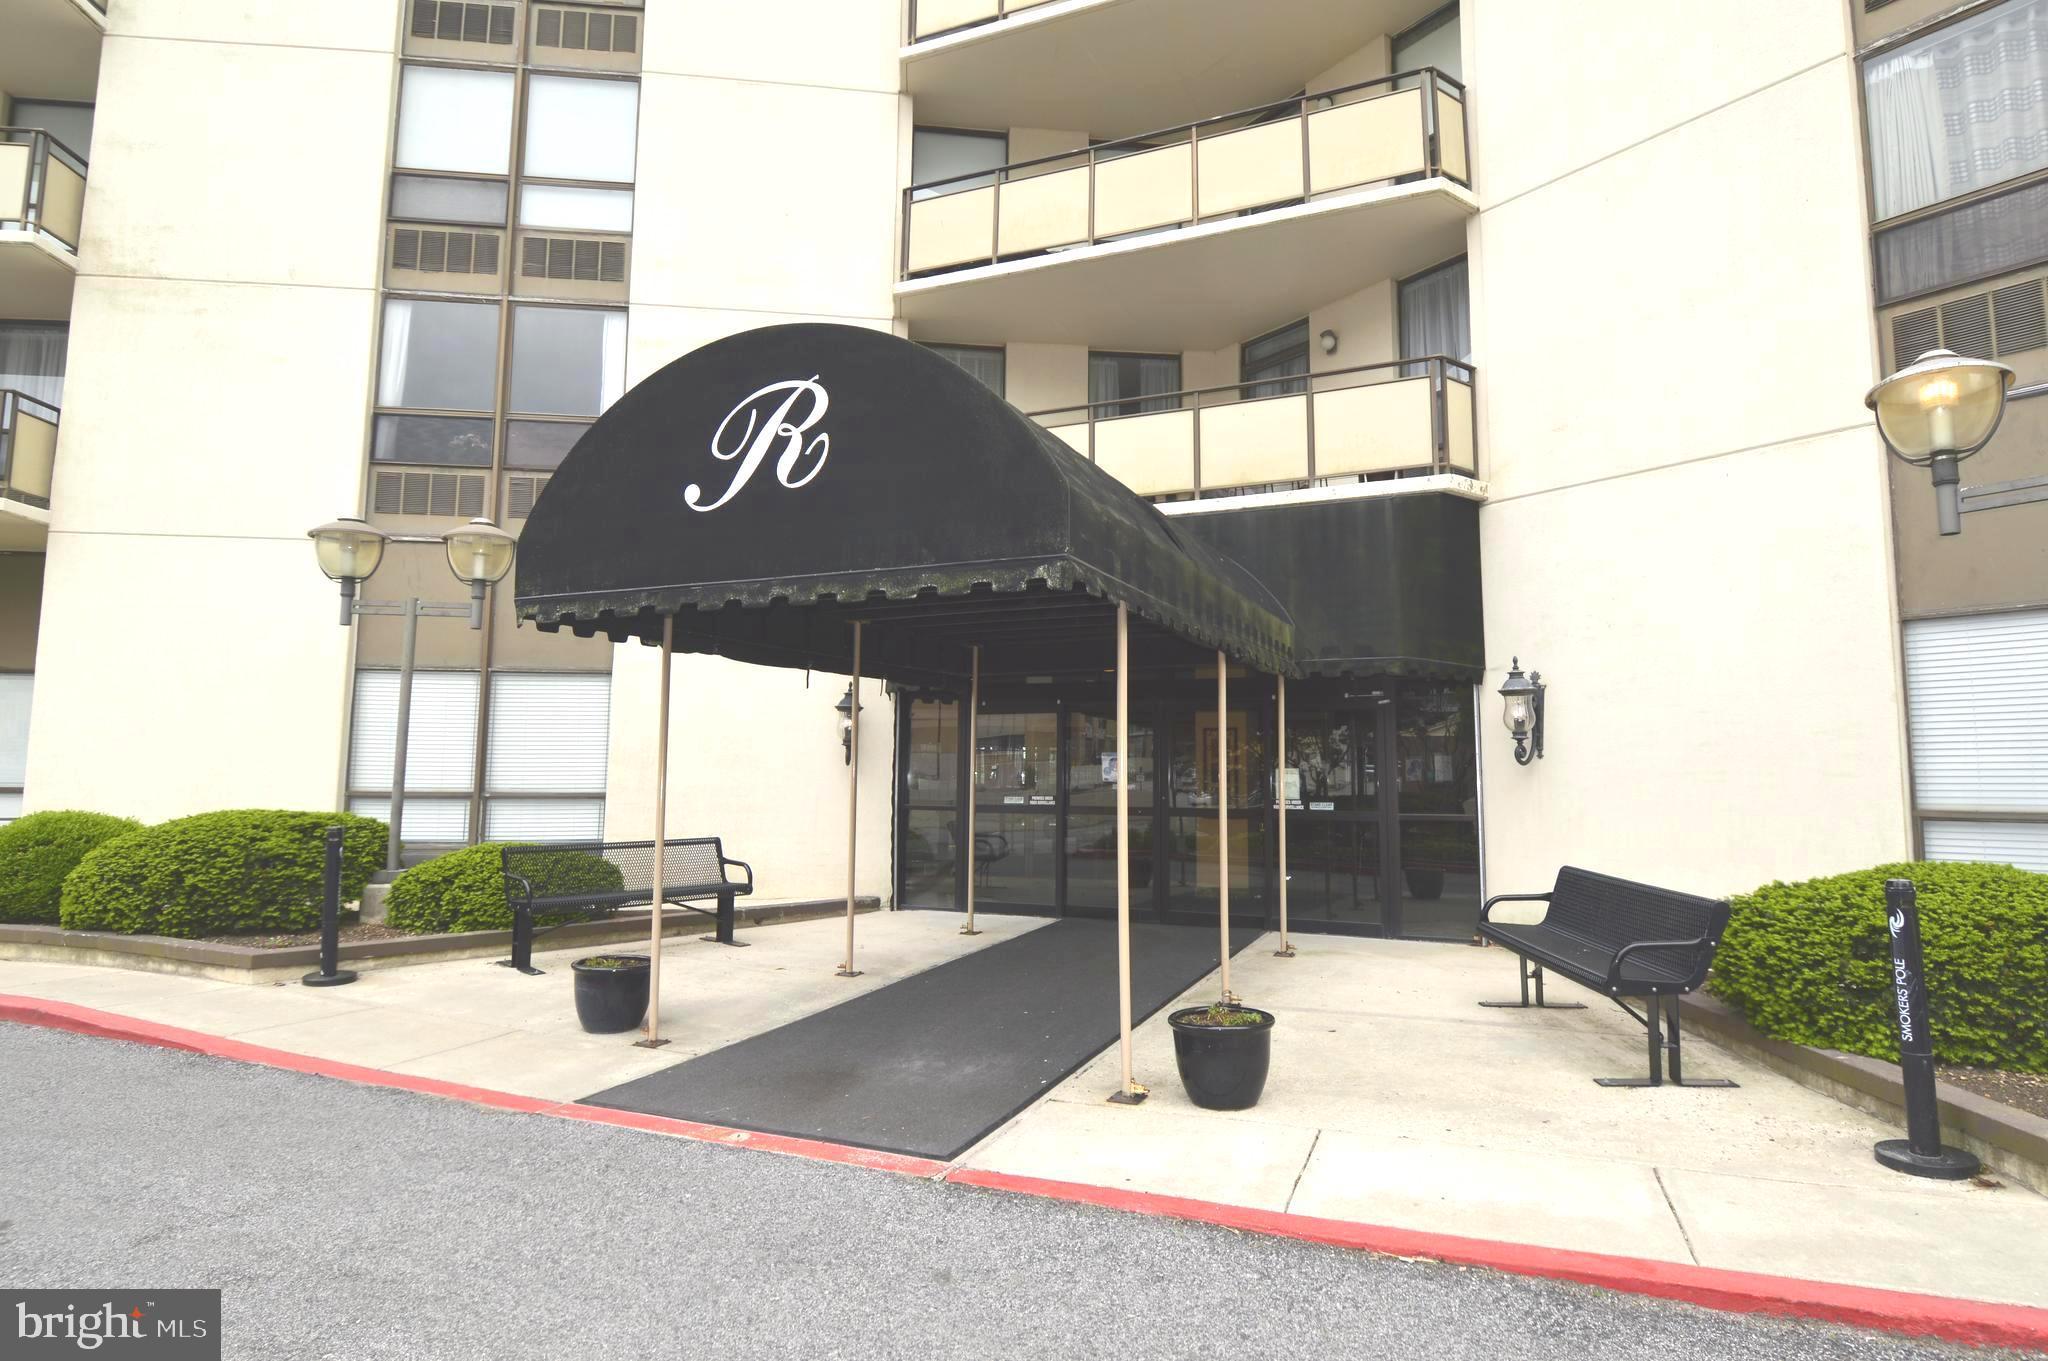 205 E JOPPA ROAD, TOWSON, Maryland 21286, 1 Bedroom Bedrooms, ,1 BathroomBathrooms,Condominium,For Sale,205 E JOPPA ROAD,MDBC527662